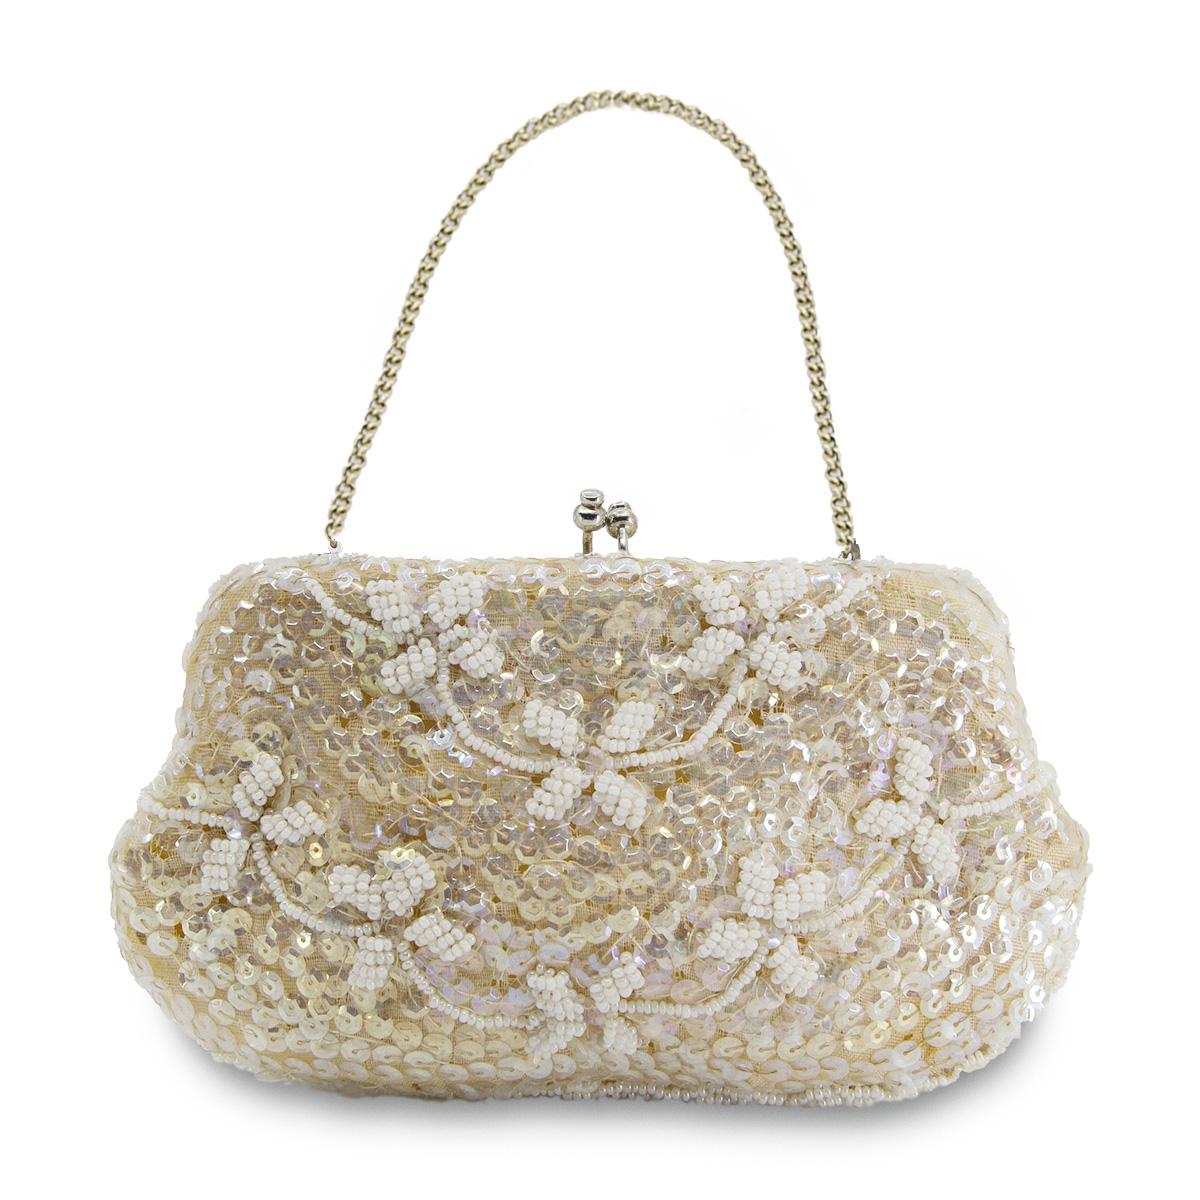 Small beaded handbag